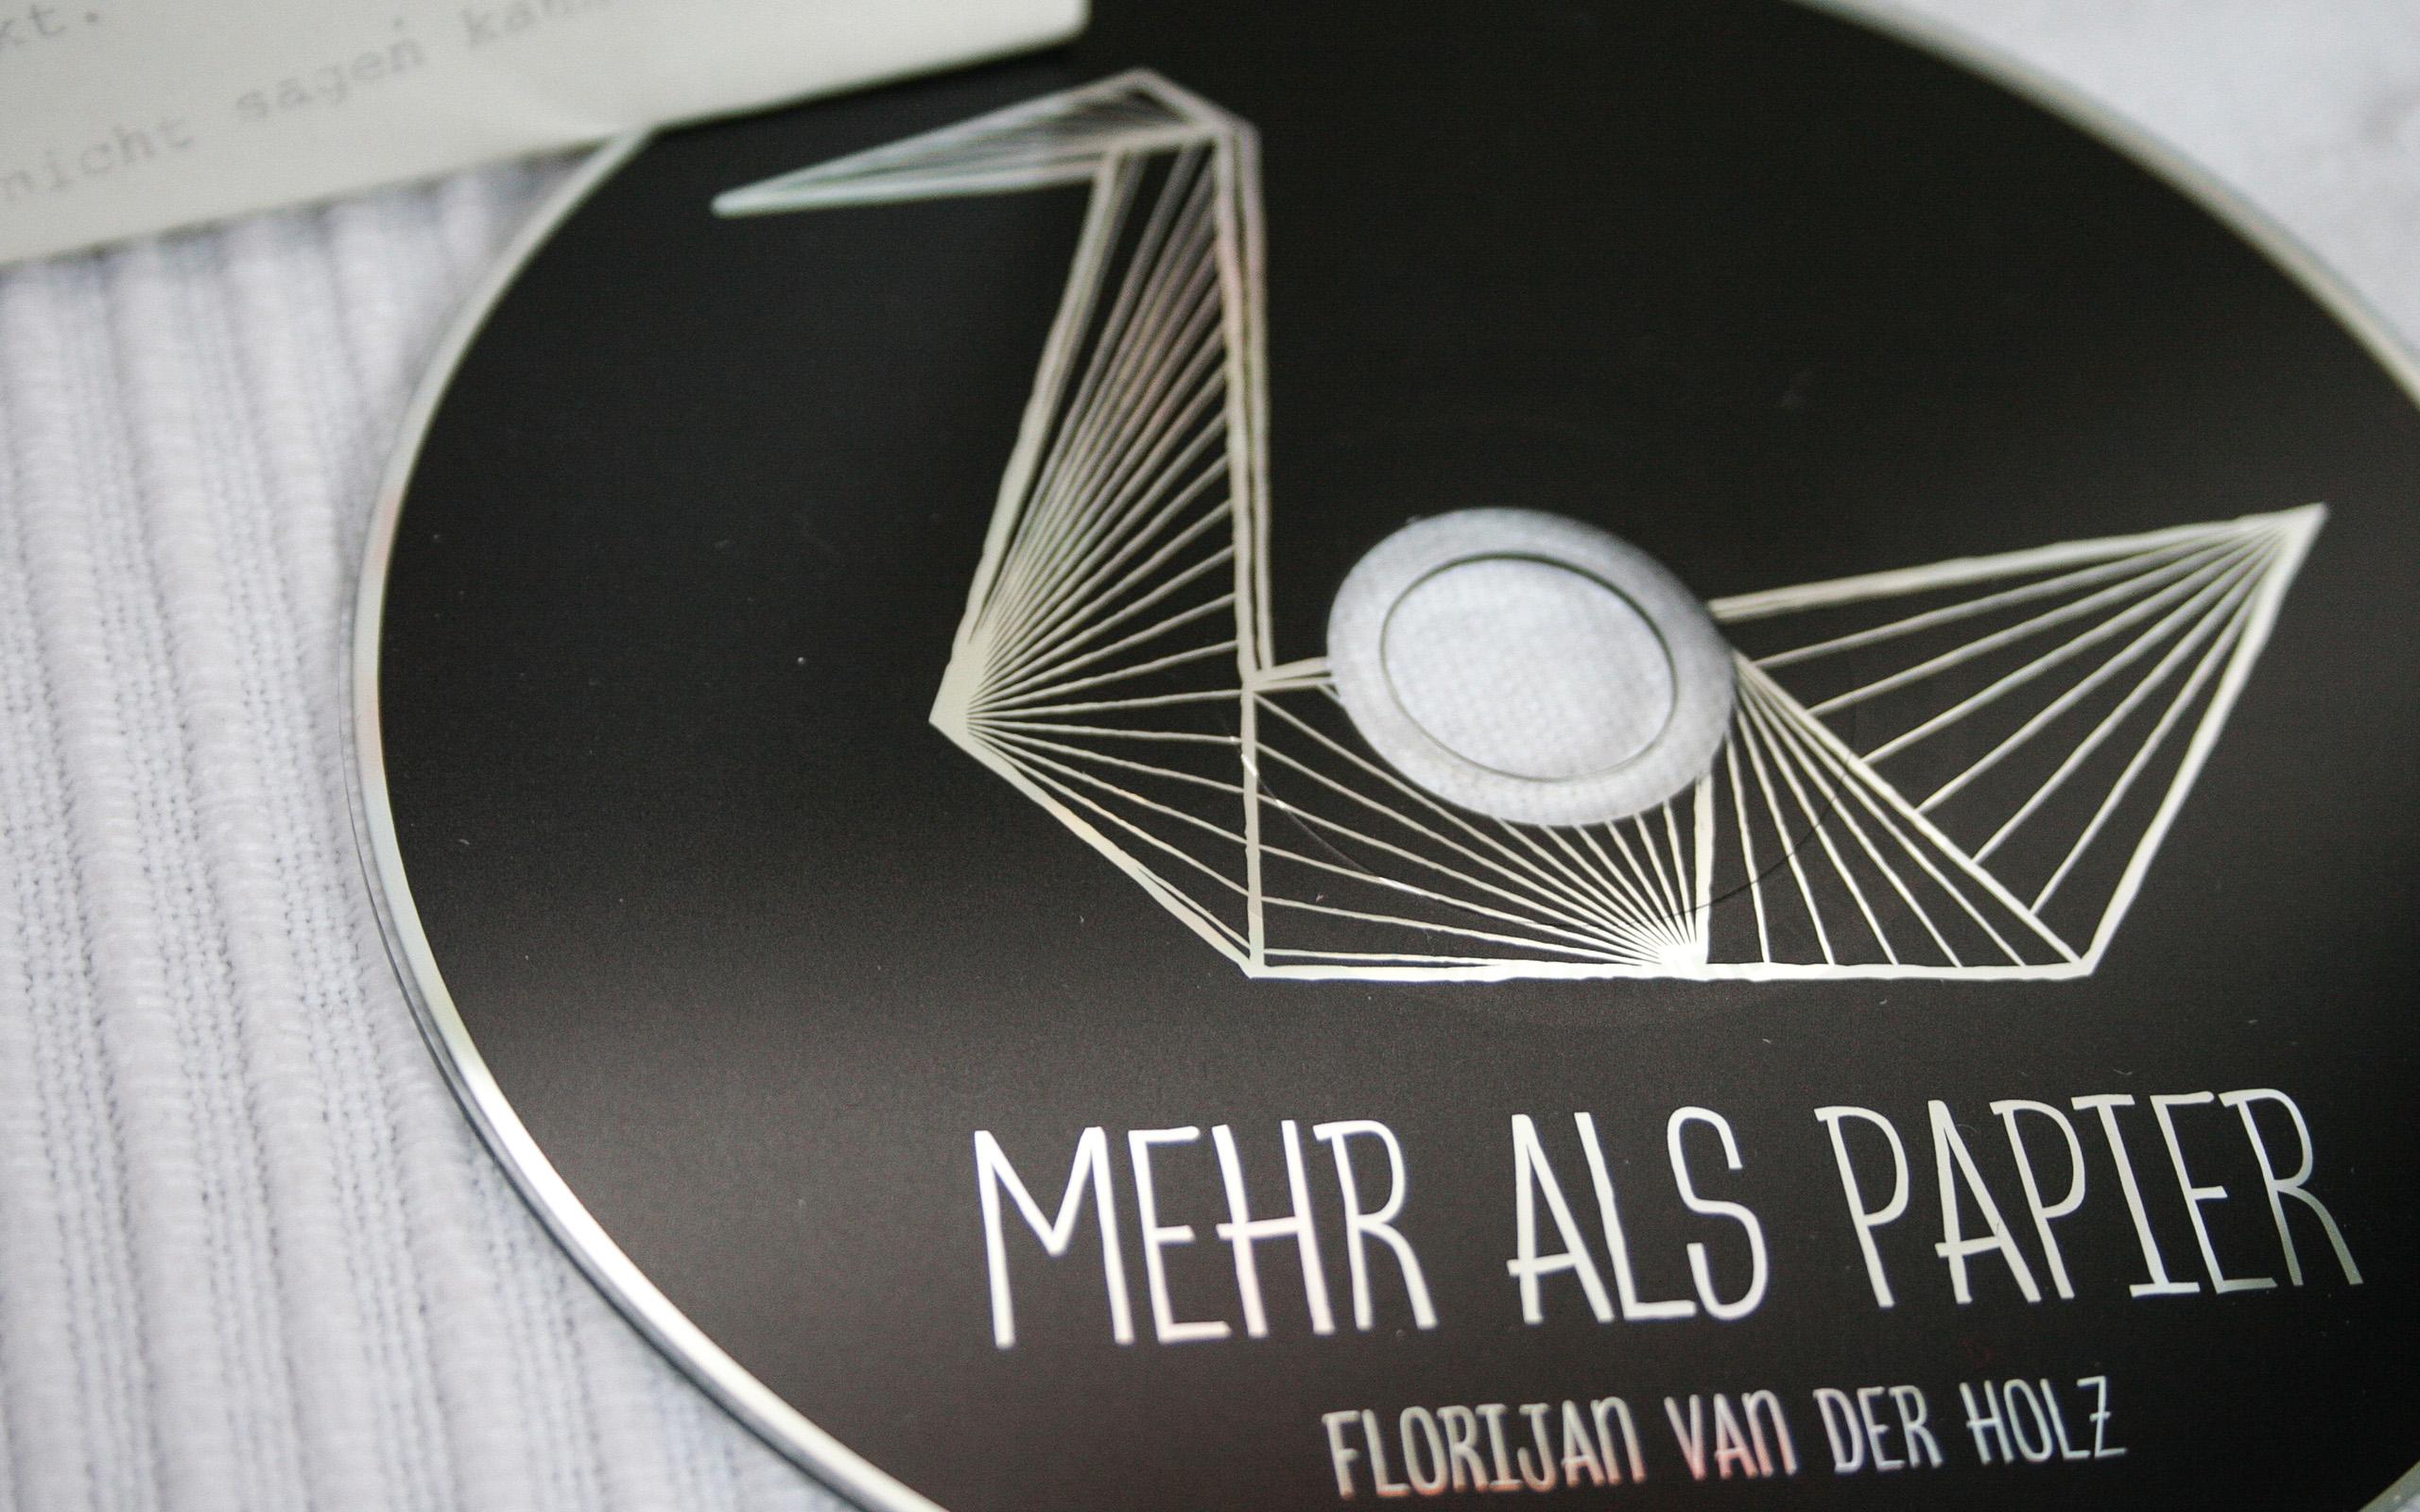 CD Florijan van der Holz